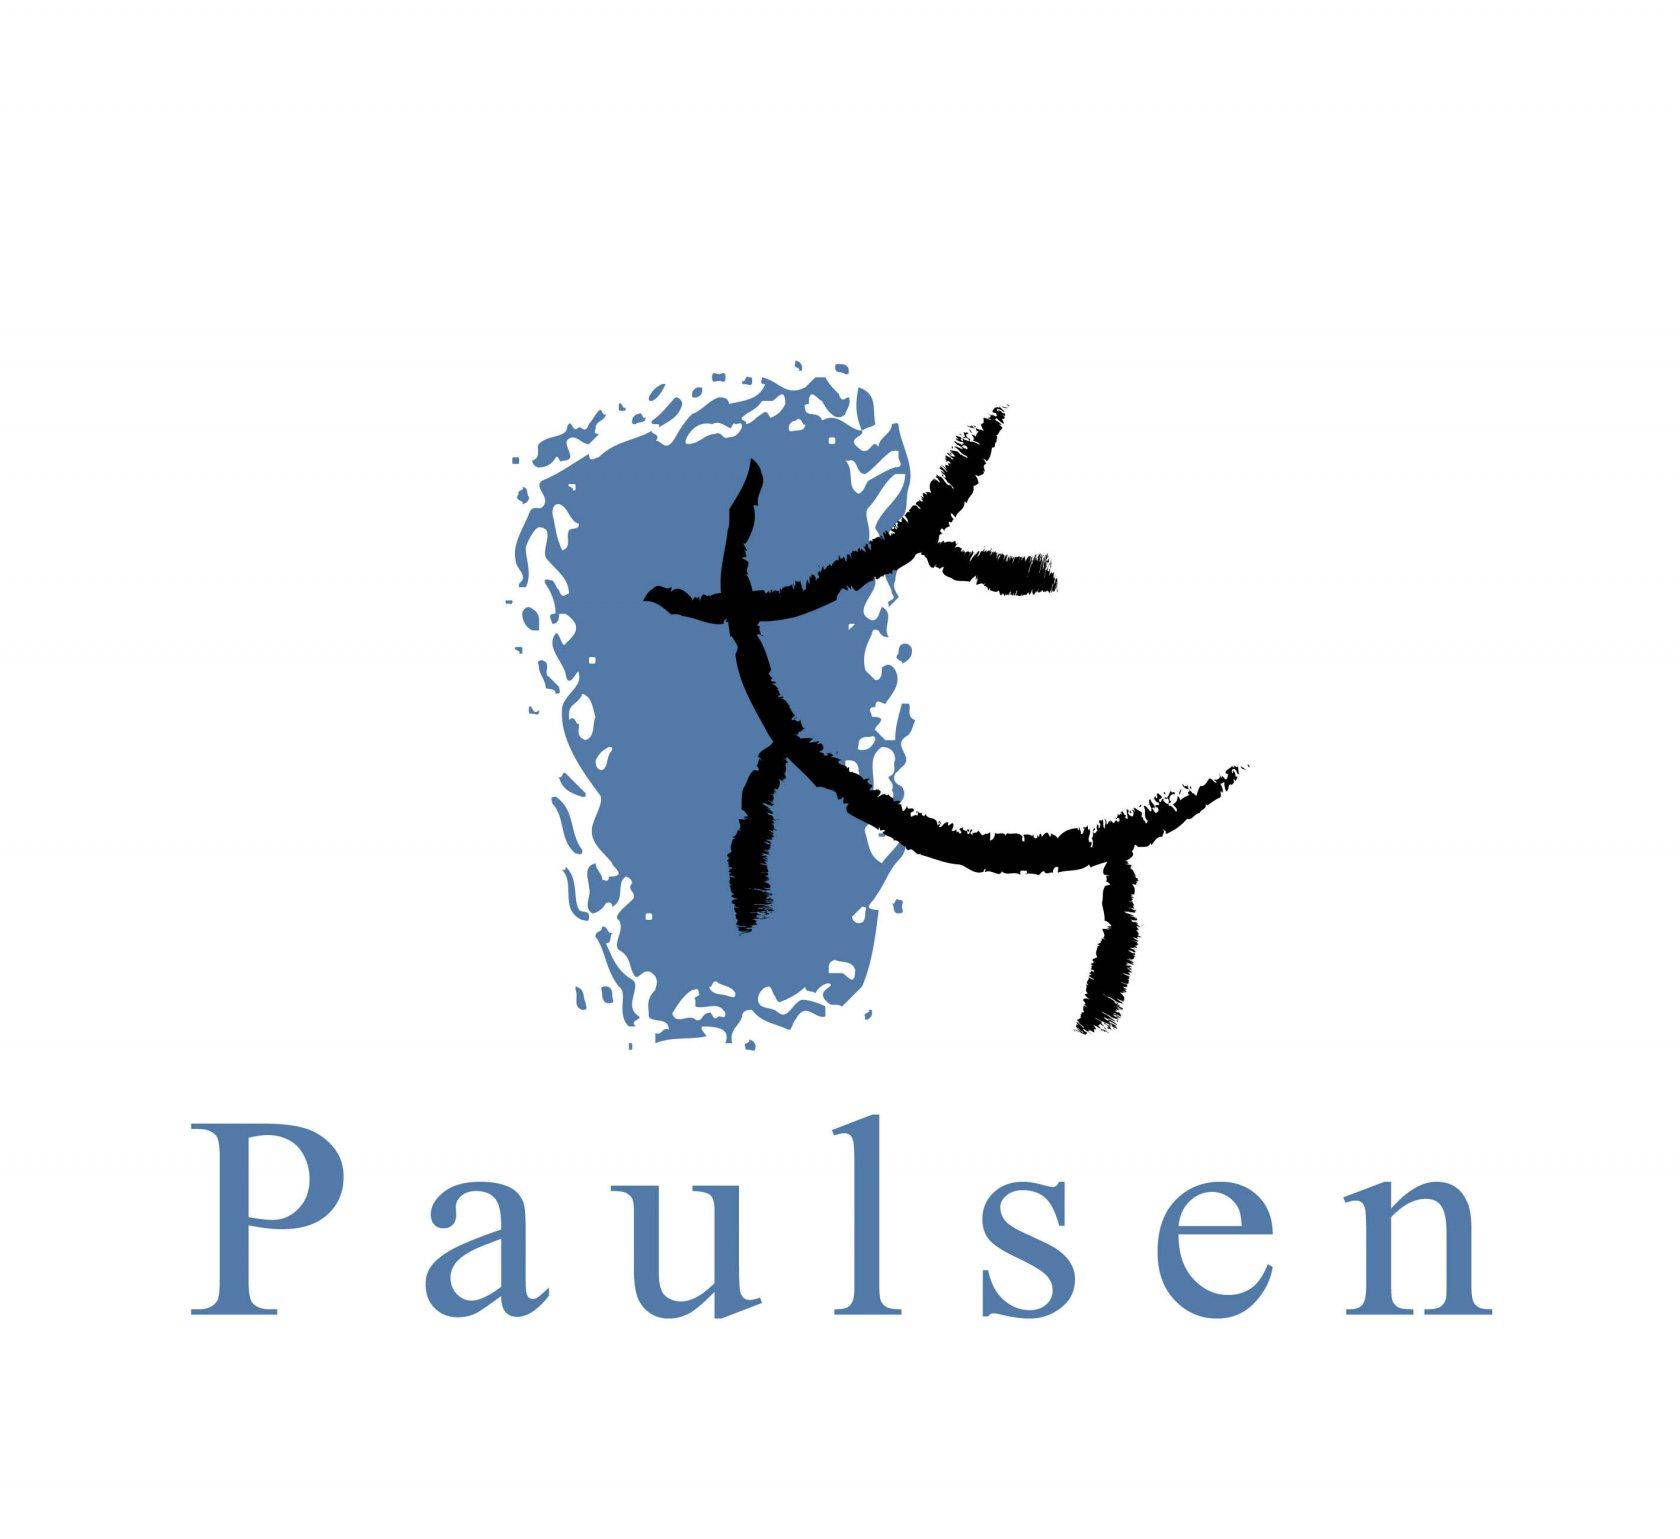 (c) Paulsen.ru